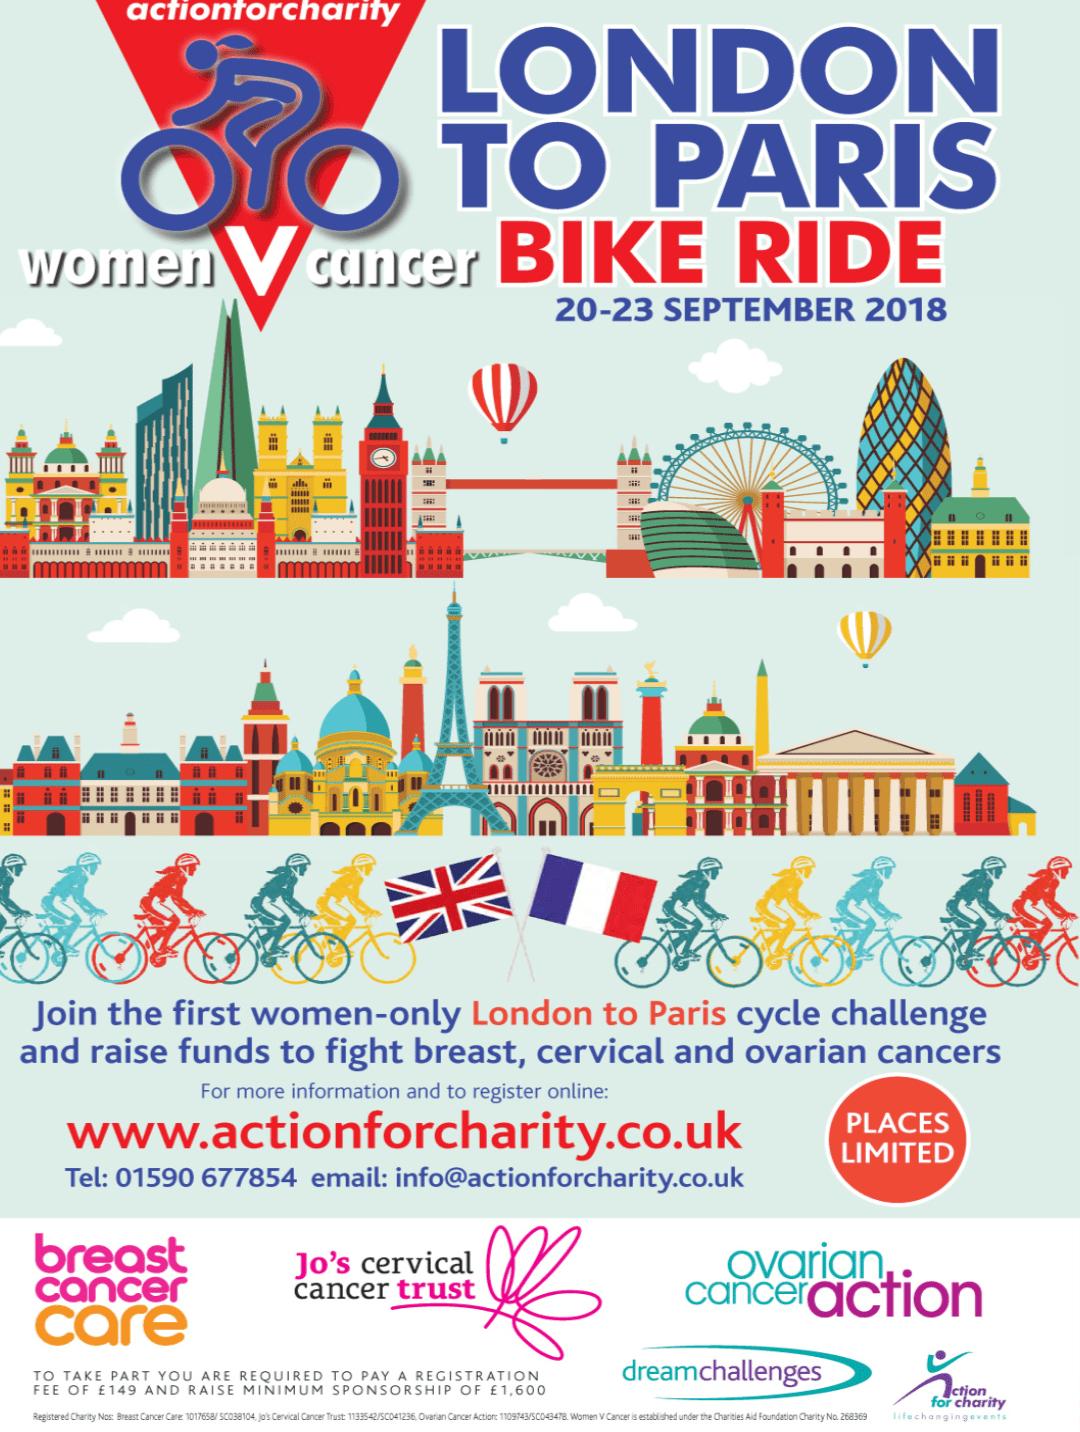 Women V Cancer London to Paris Bike Ride 2017 - Megan Sutliffe